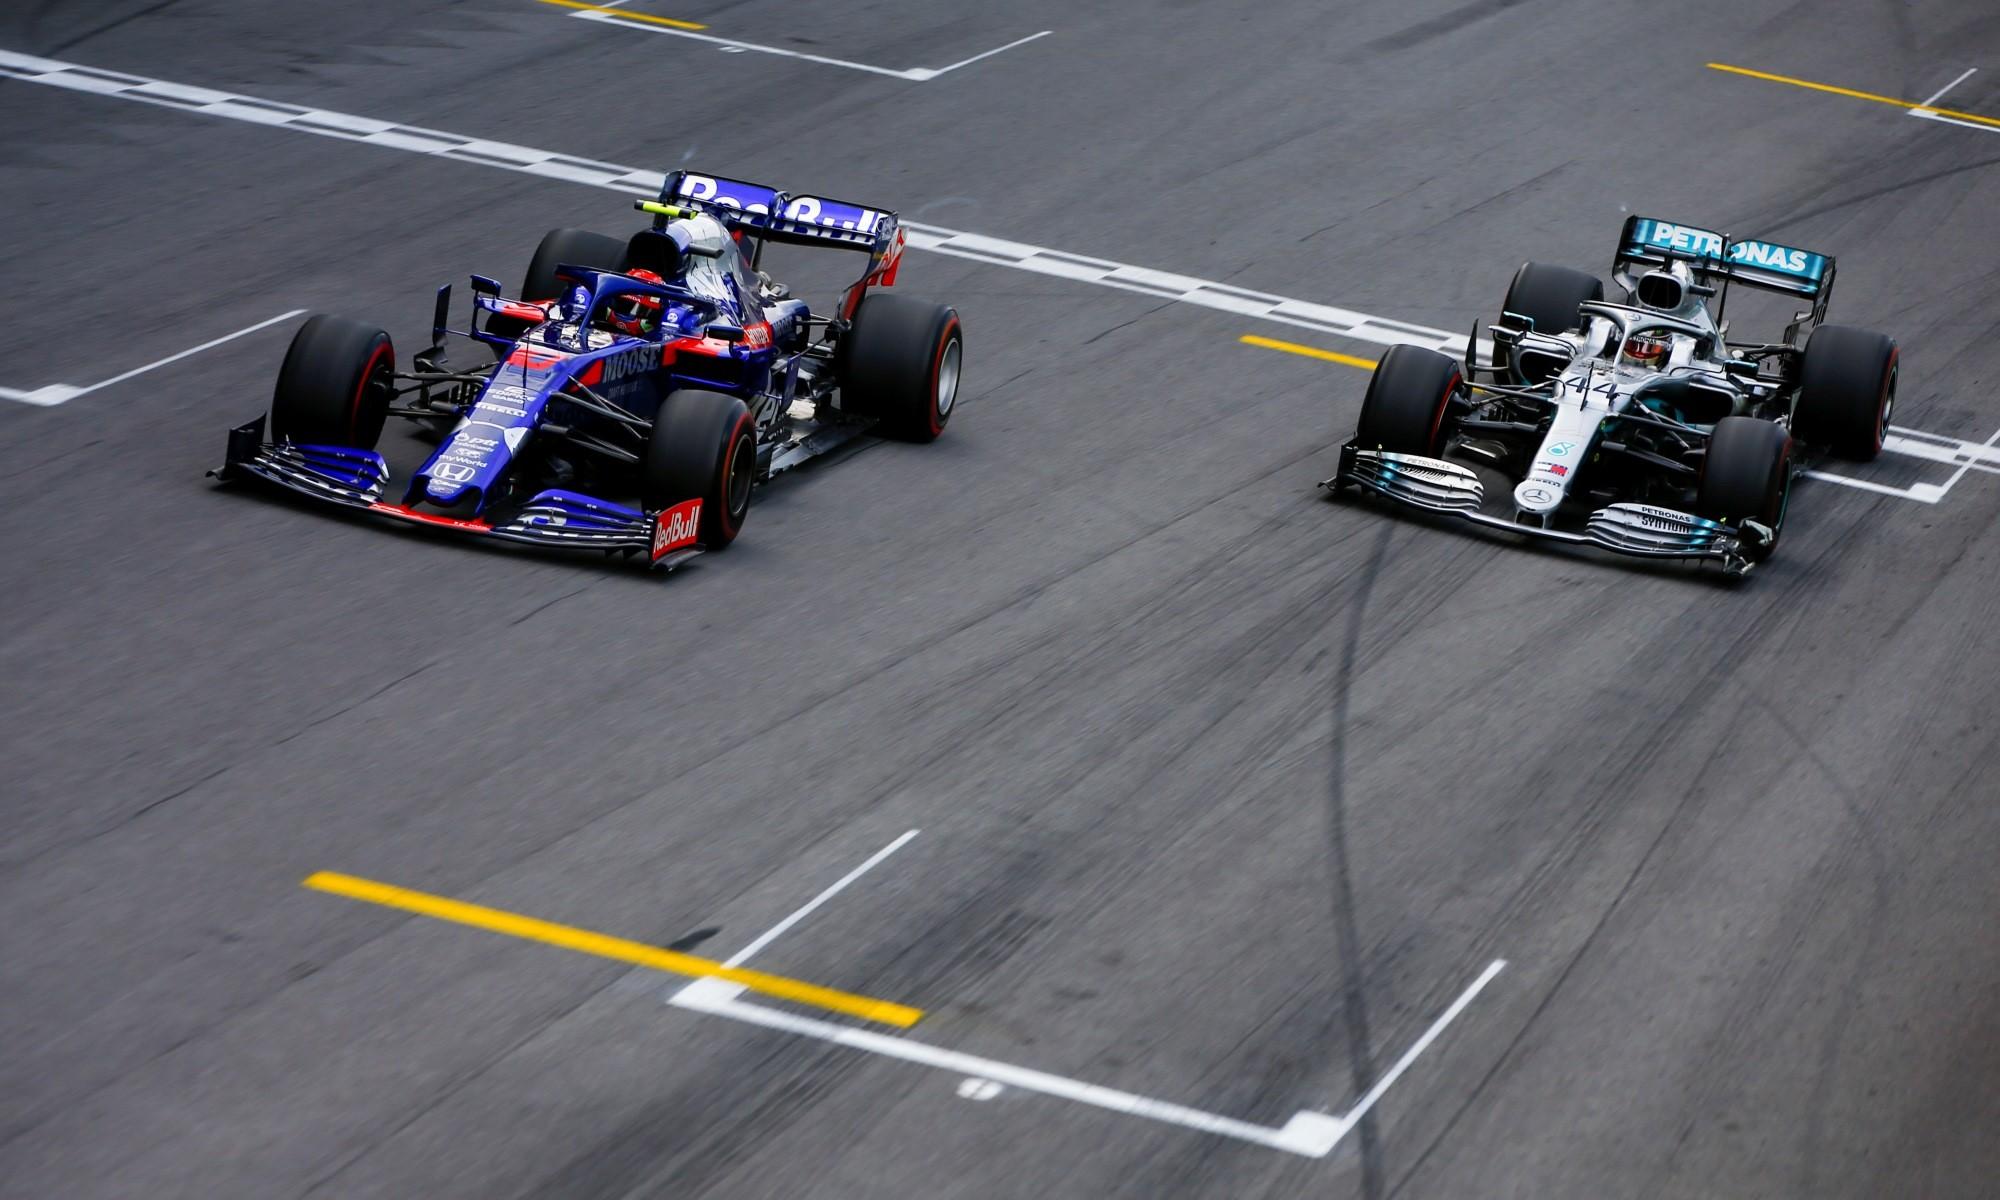 F1 Review Brazil 2019